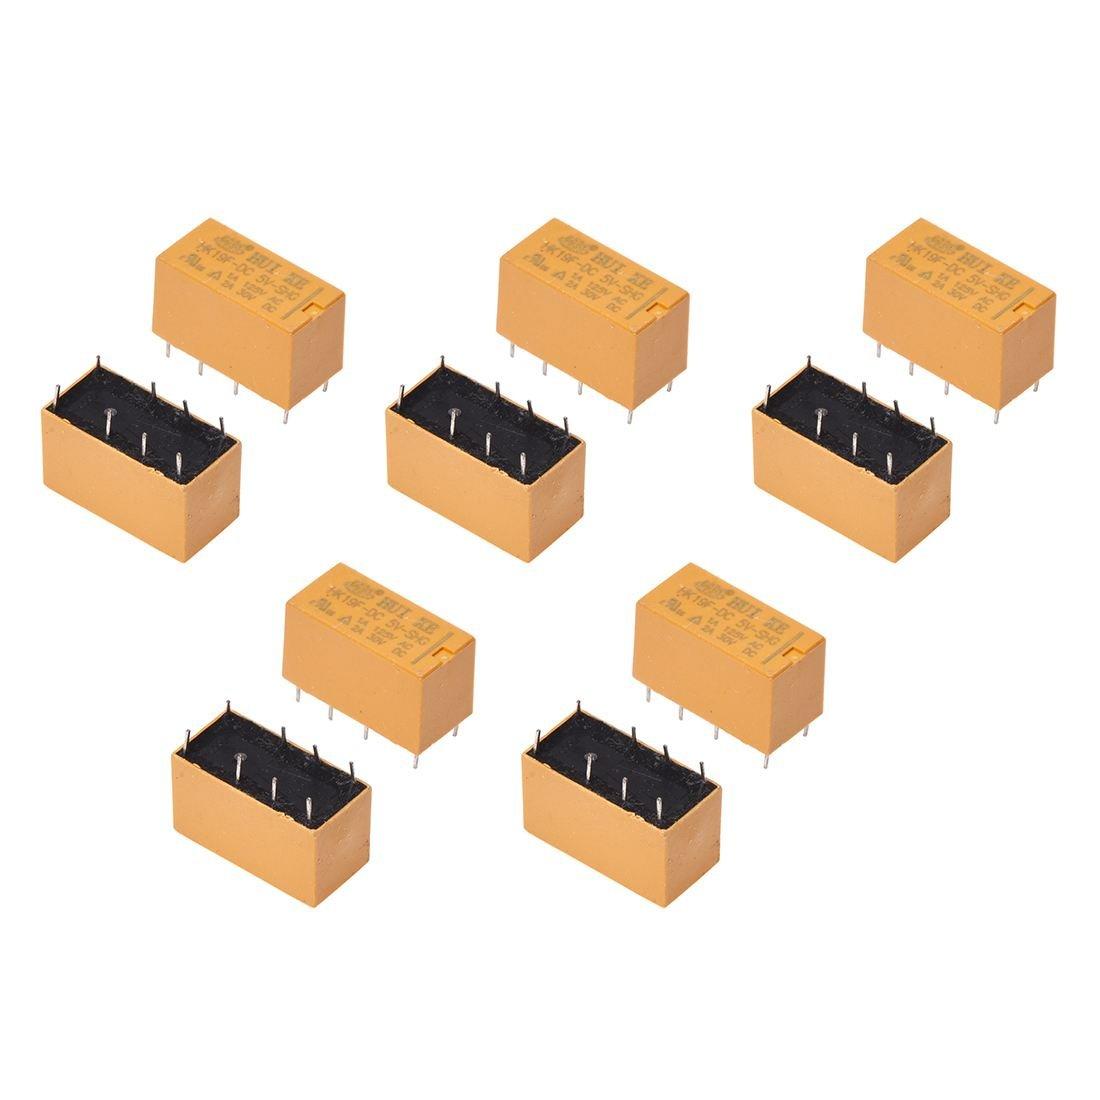 Sonline 10 x DC 5V Coil 125V/1A DC 30V/2A AC 2A/30V DC 8 Pins DPDT Power Relay HK19F